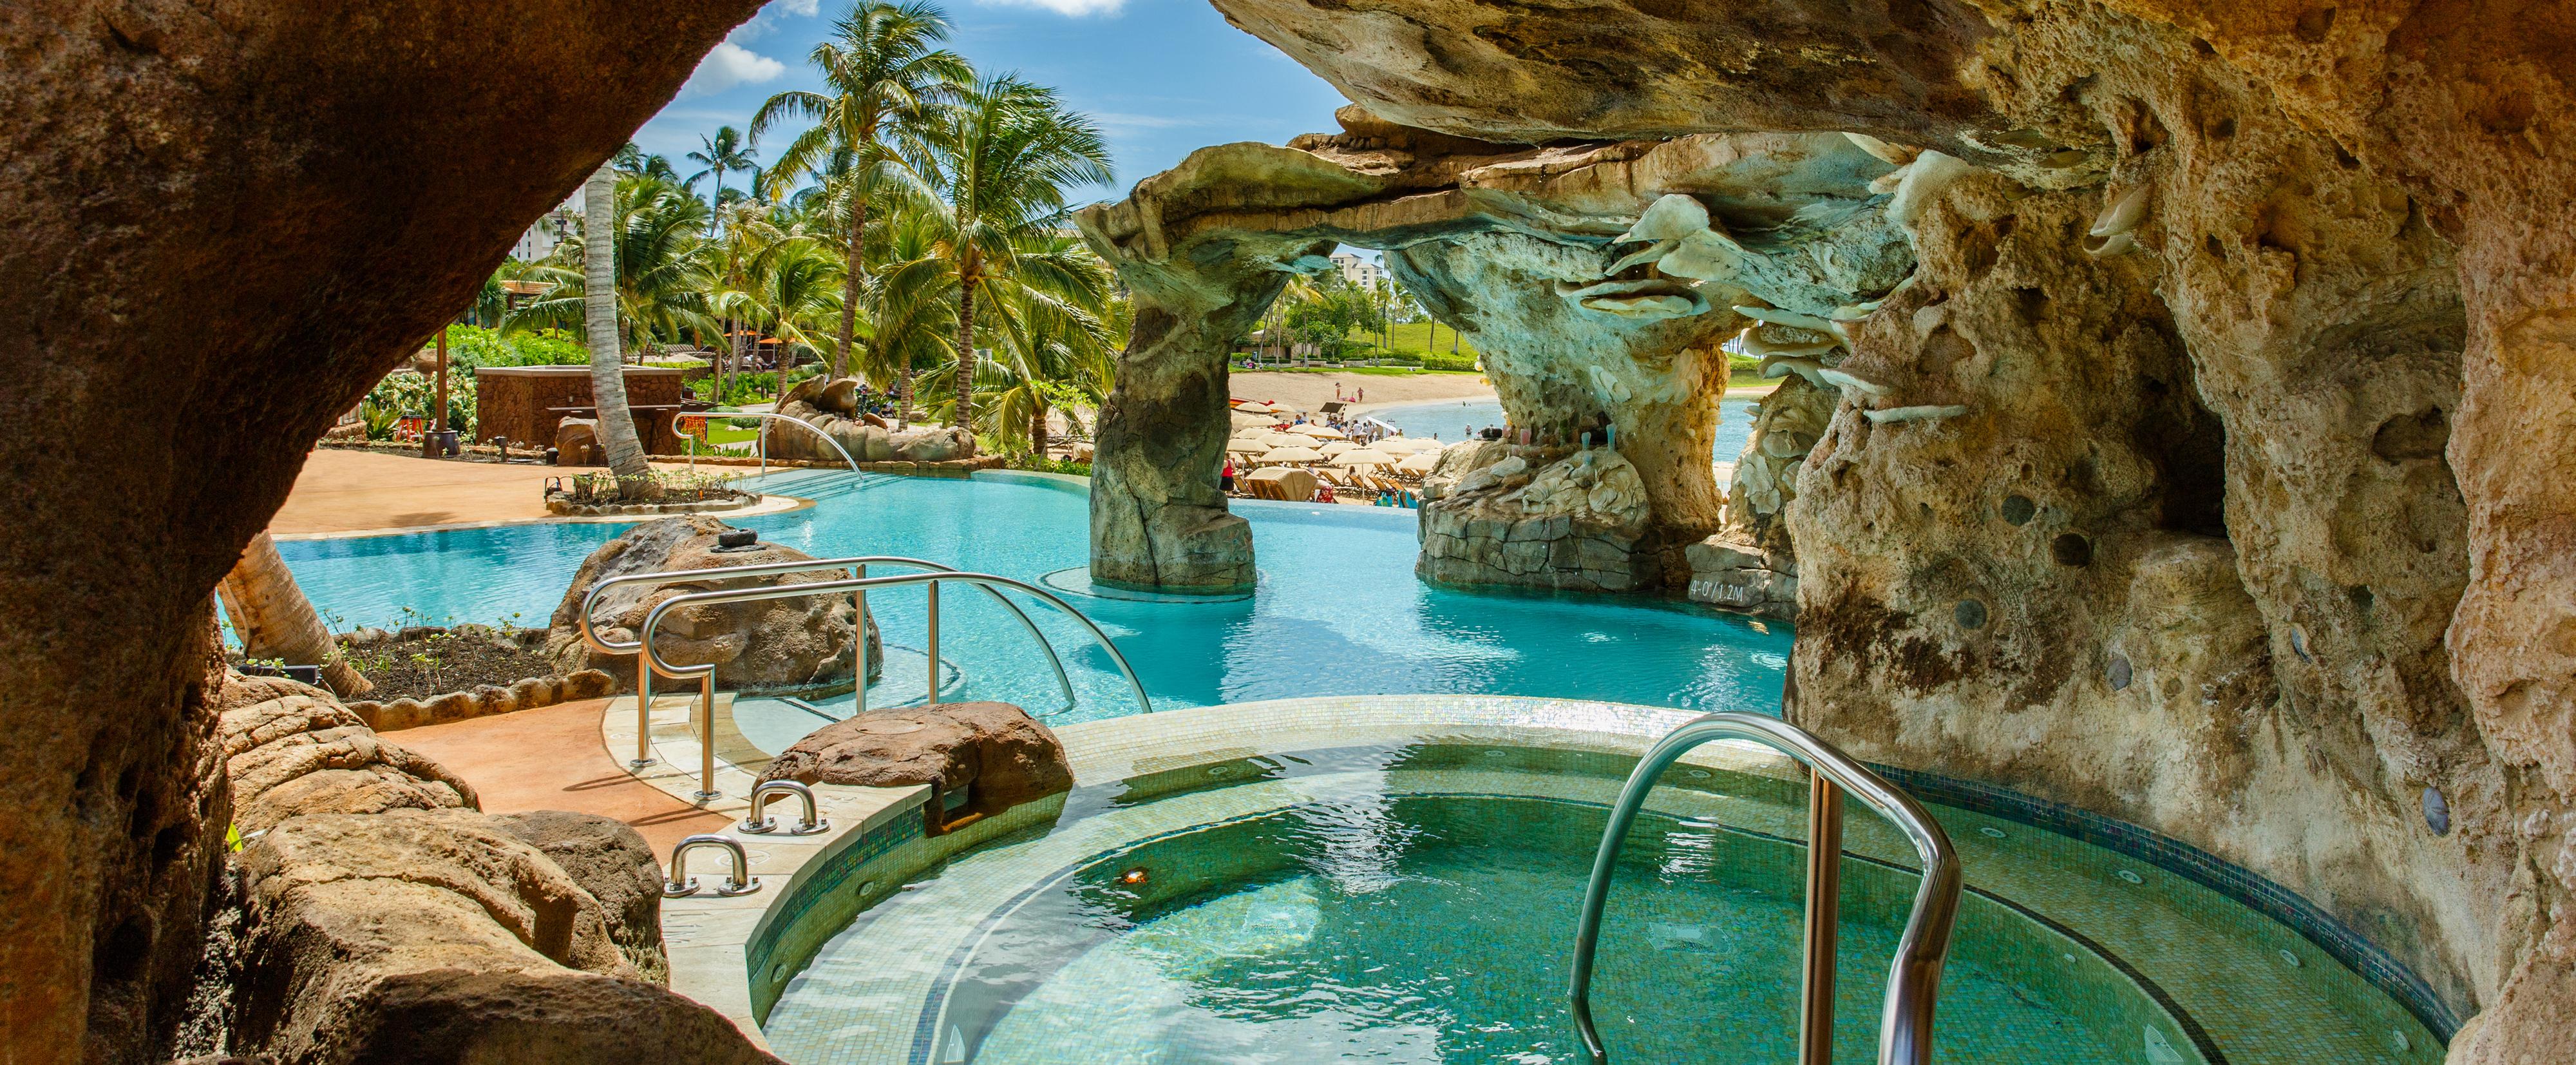 ka maka grotto infinity pool aulani hawaii resort u0026 spa